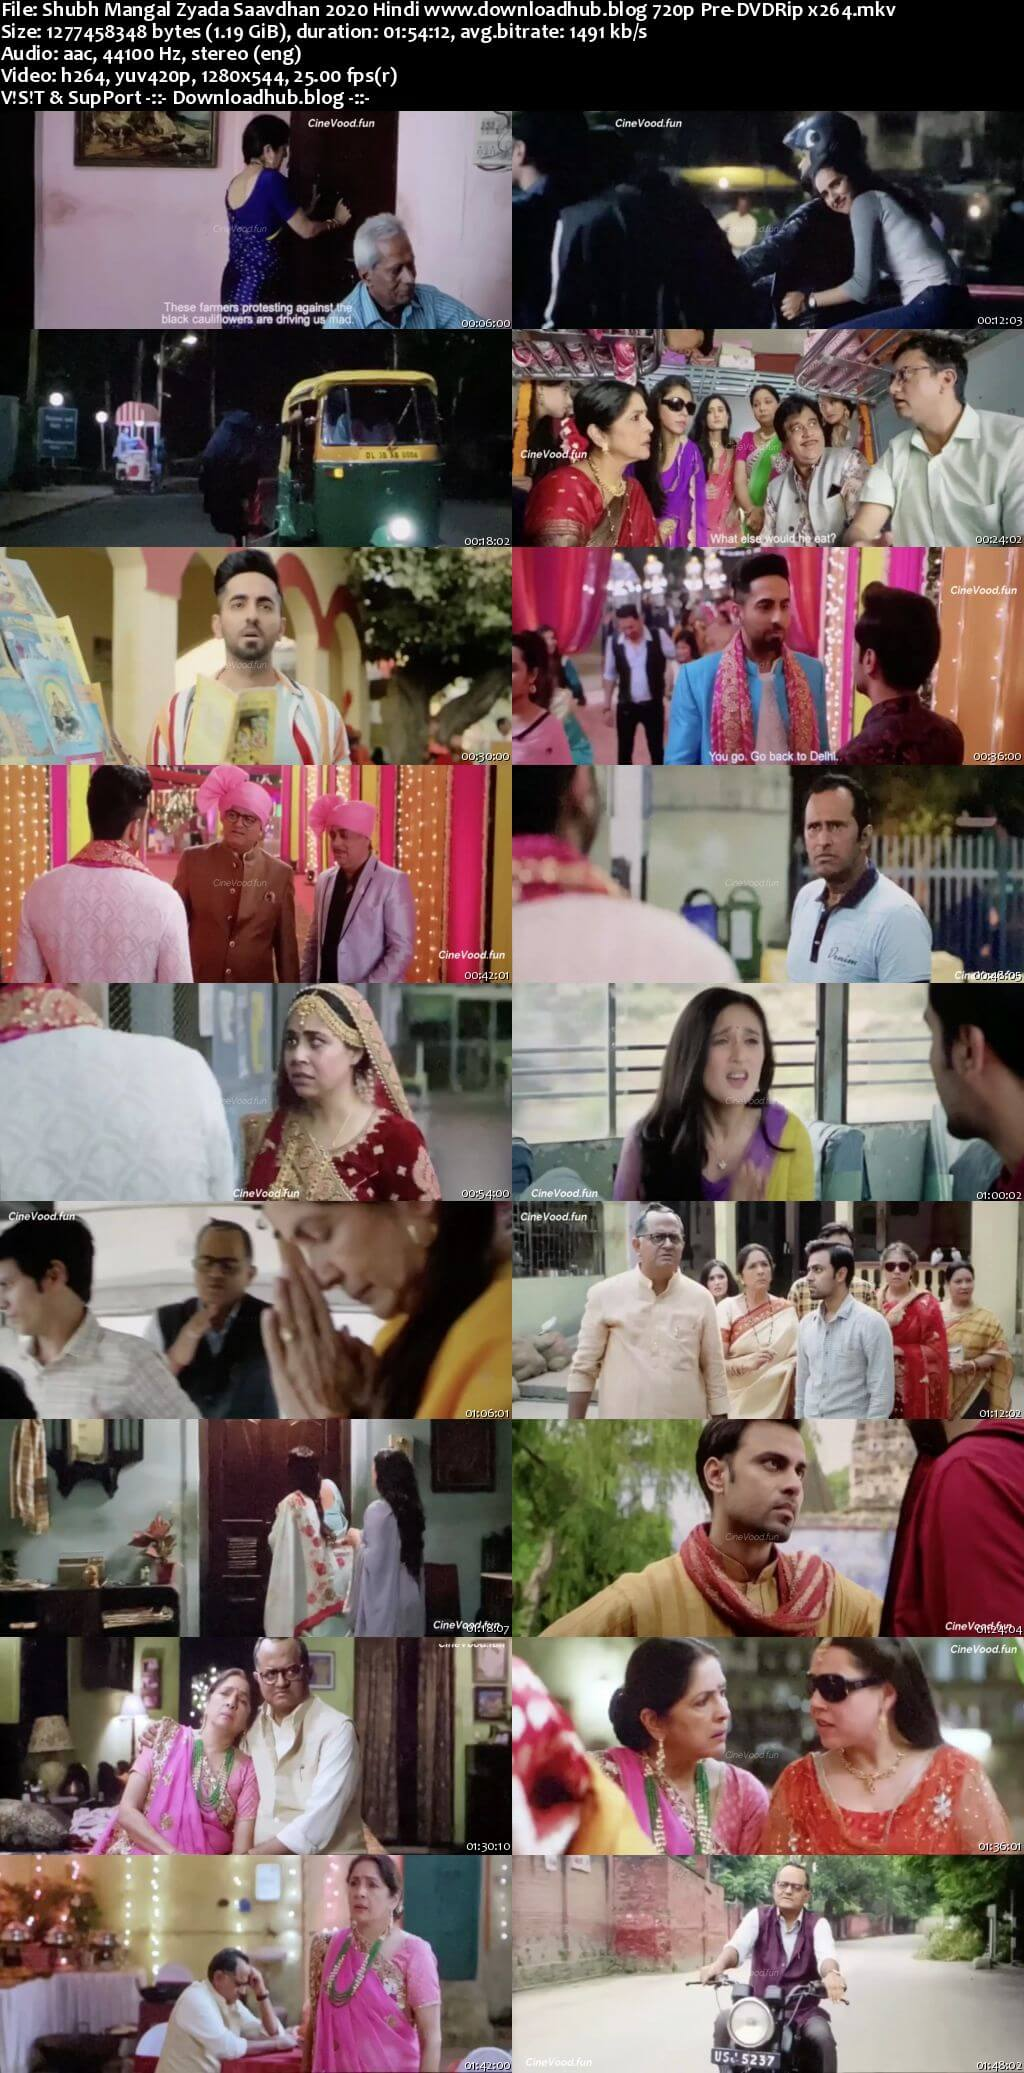 Shubh Mangal Zyada Saavdhan 2020 Hindi 720p 480p Pre-DVDRip x264